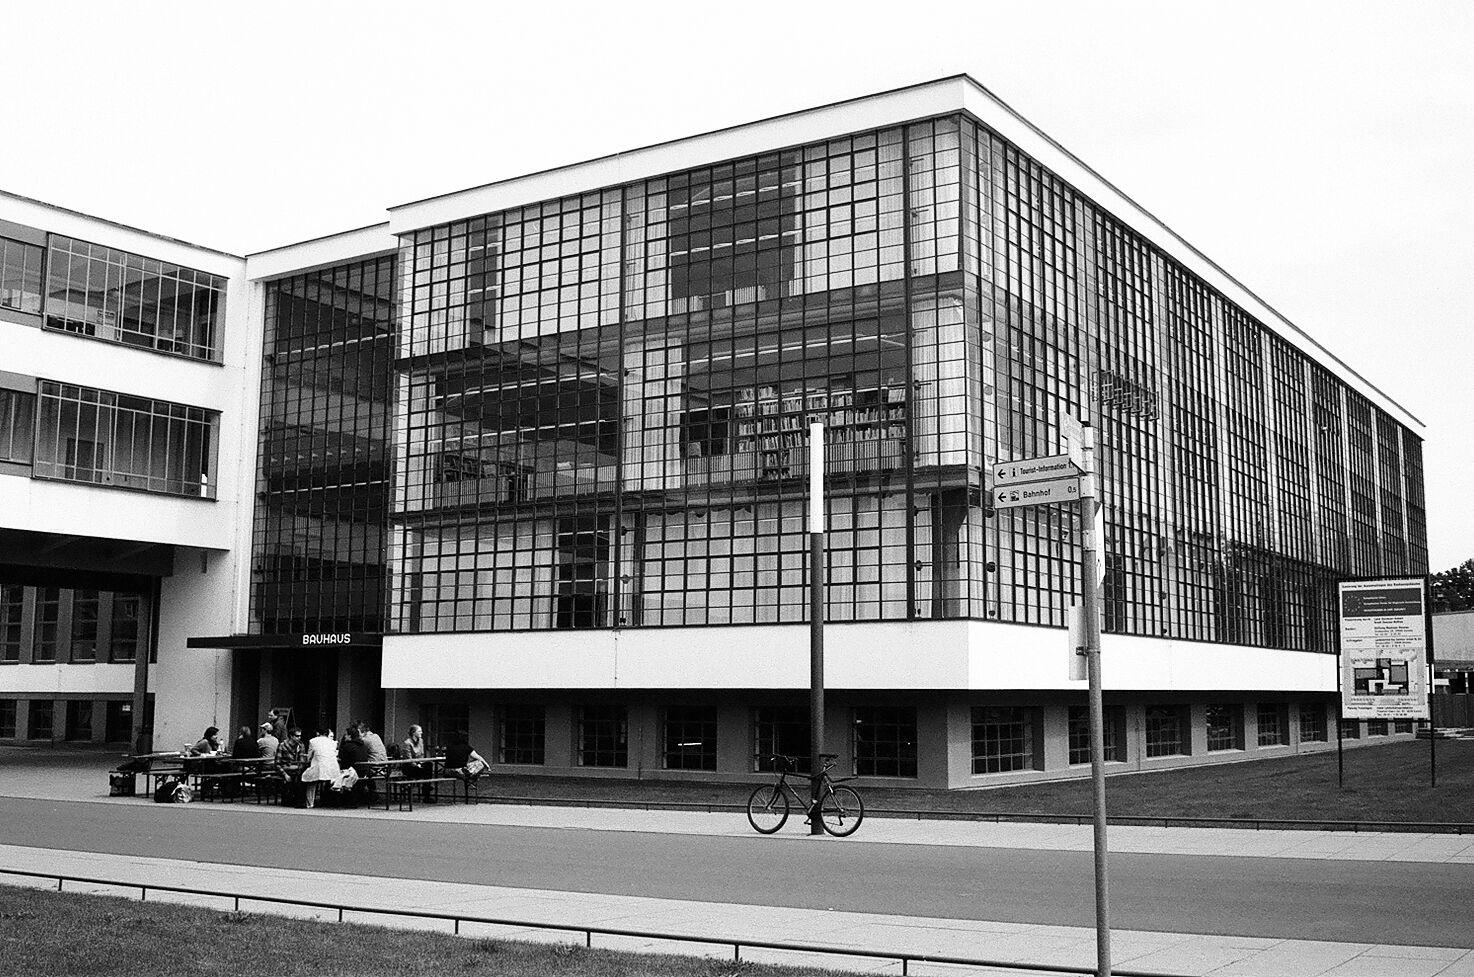 Bauhaus Baumarkt Dessau bauhaus dessau search bauhaus